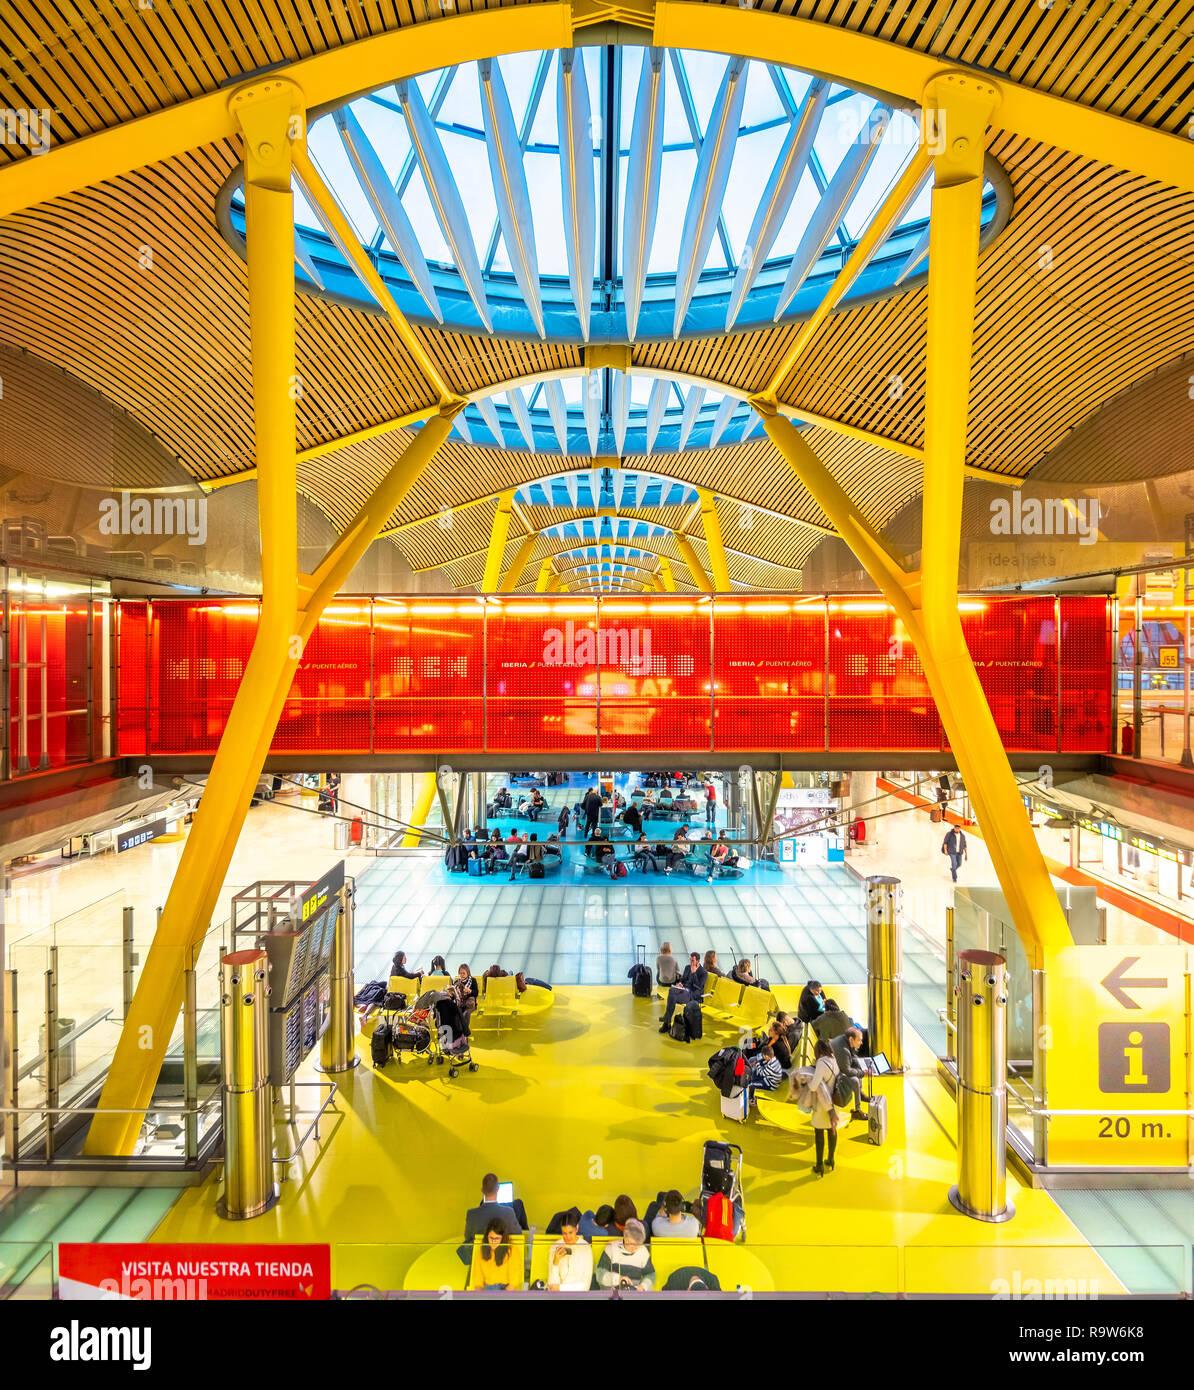 Terminal de l'aéroport de Madrid Aéroport Madrid Barajas 4 conçu par Antonio Lamela, Richard Rogers, Aeropuerto Adolfo Suárez. Madrid-Barajas Banque D'Images